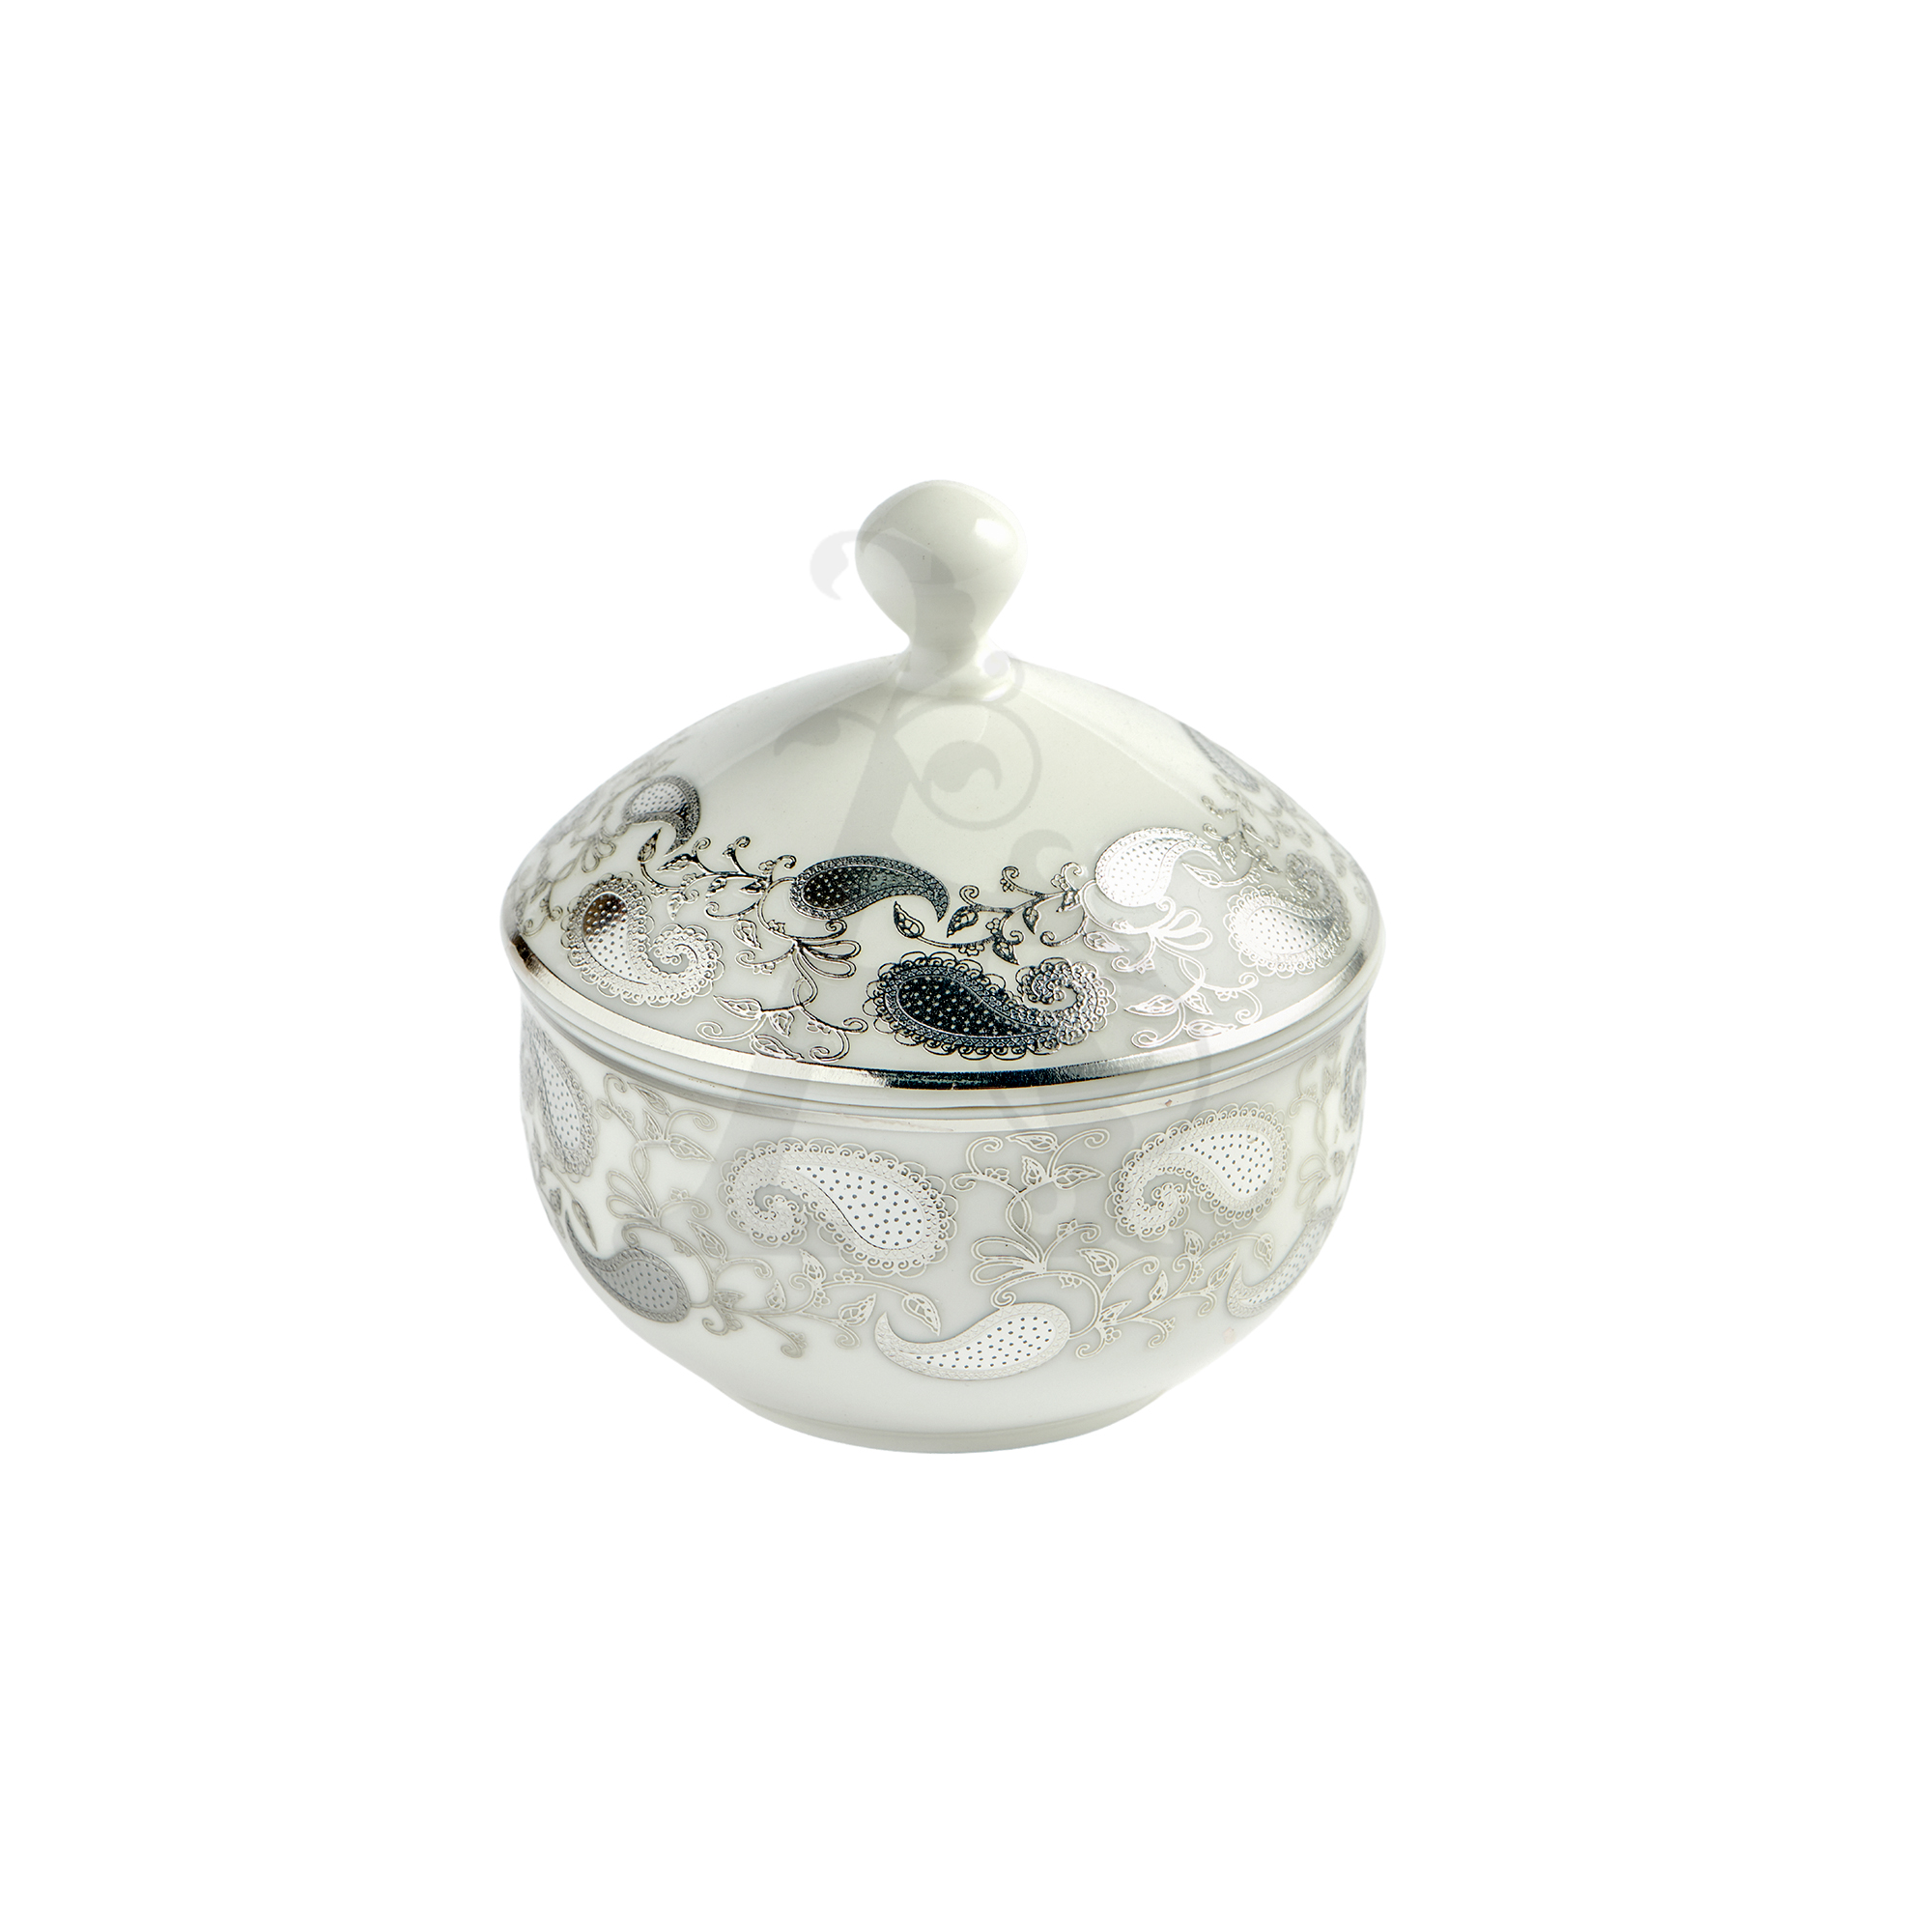 Buy Victoriana sugar pot with cover - Silver Décor 1